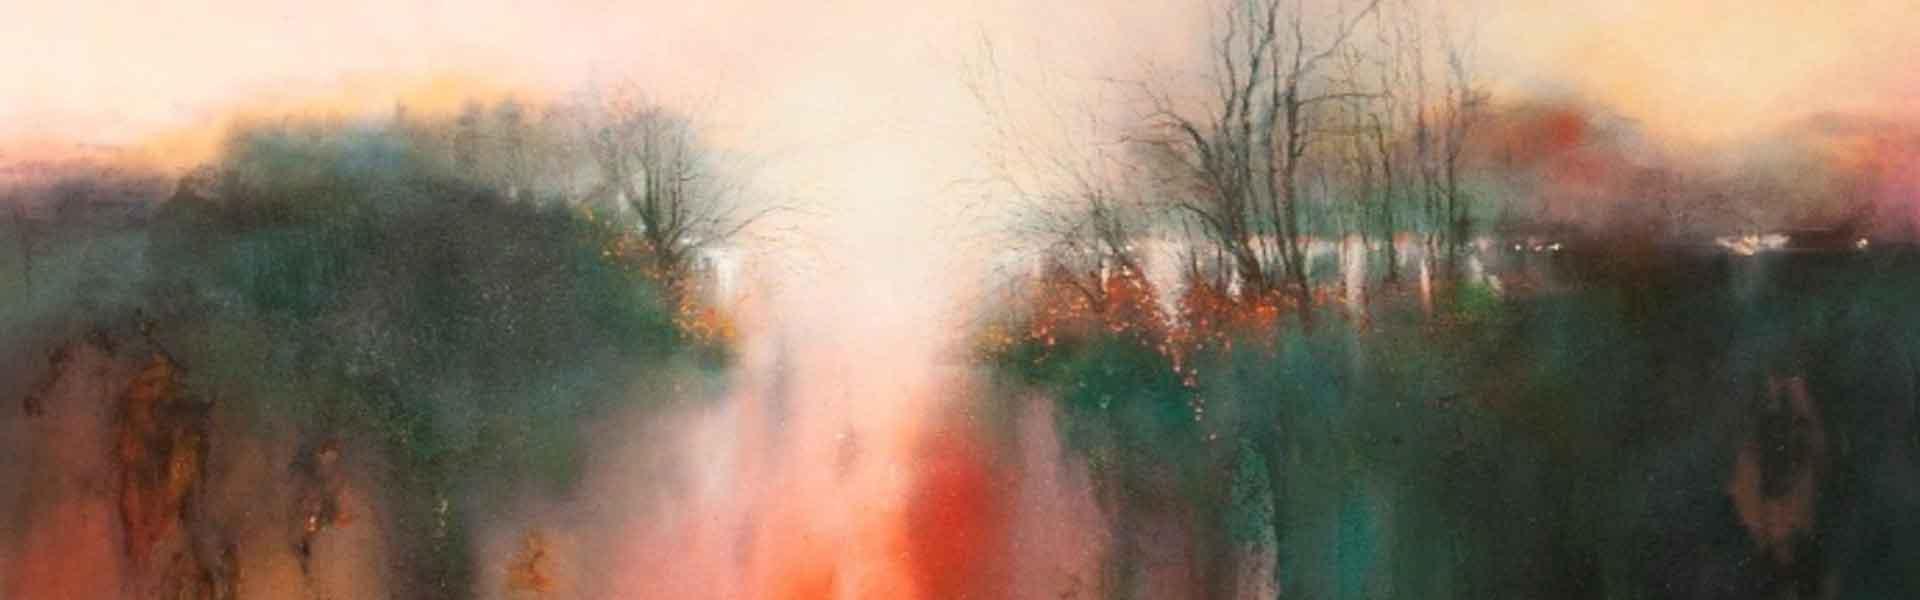 Blackwater-Floodplain-by-Carol-O'Sullivan